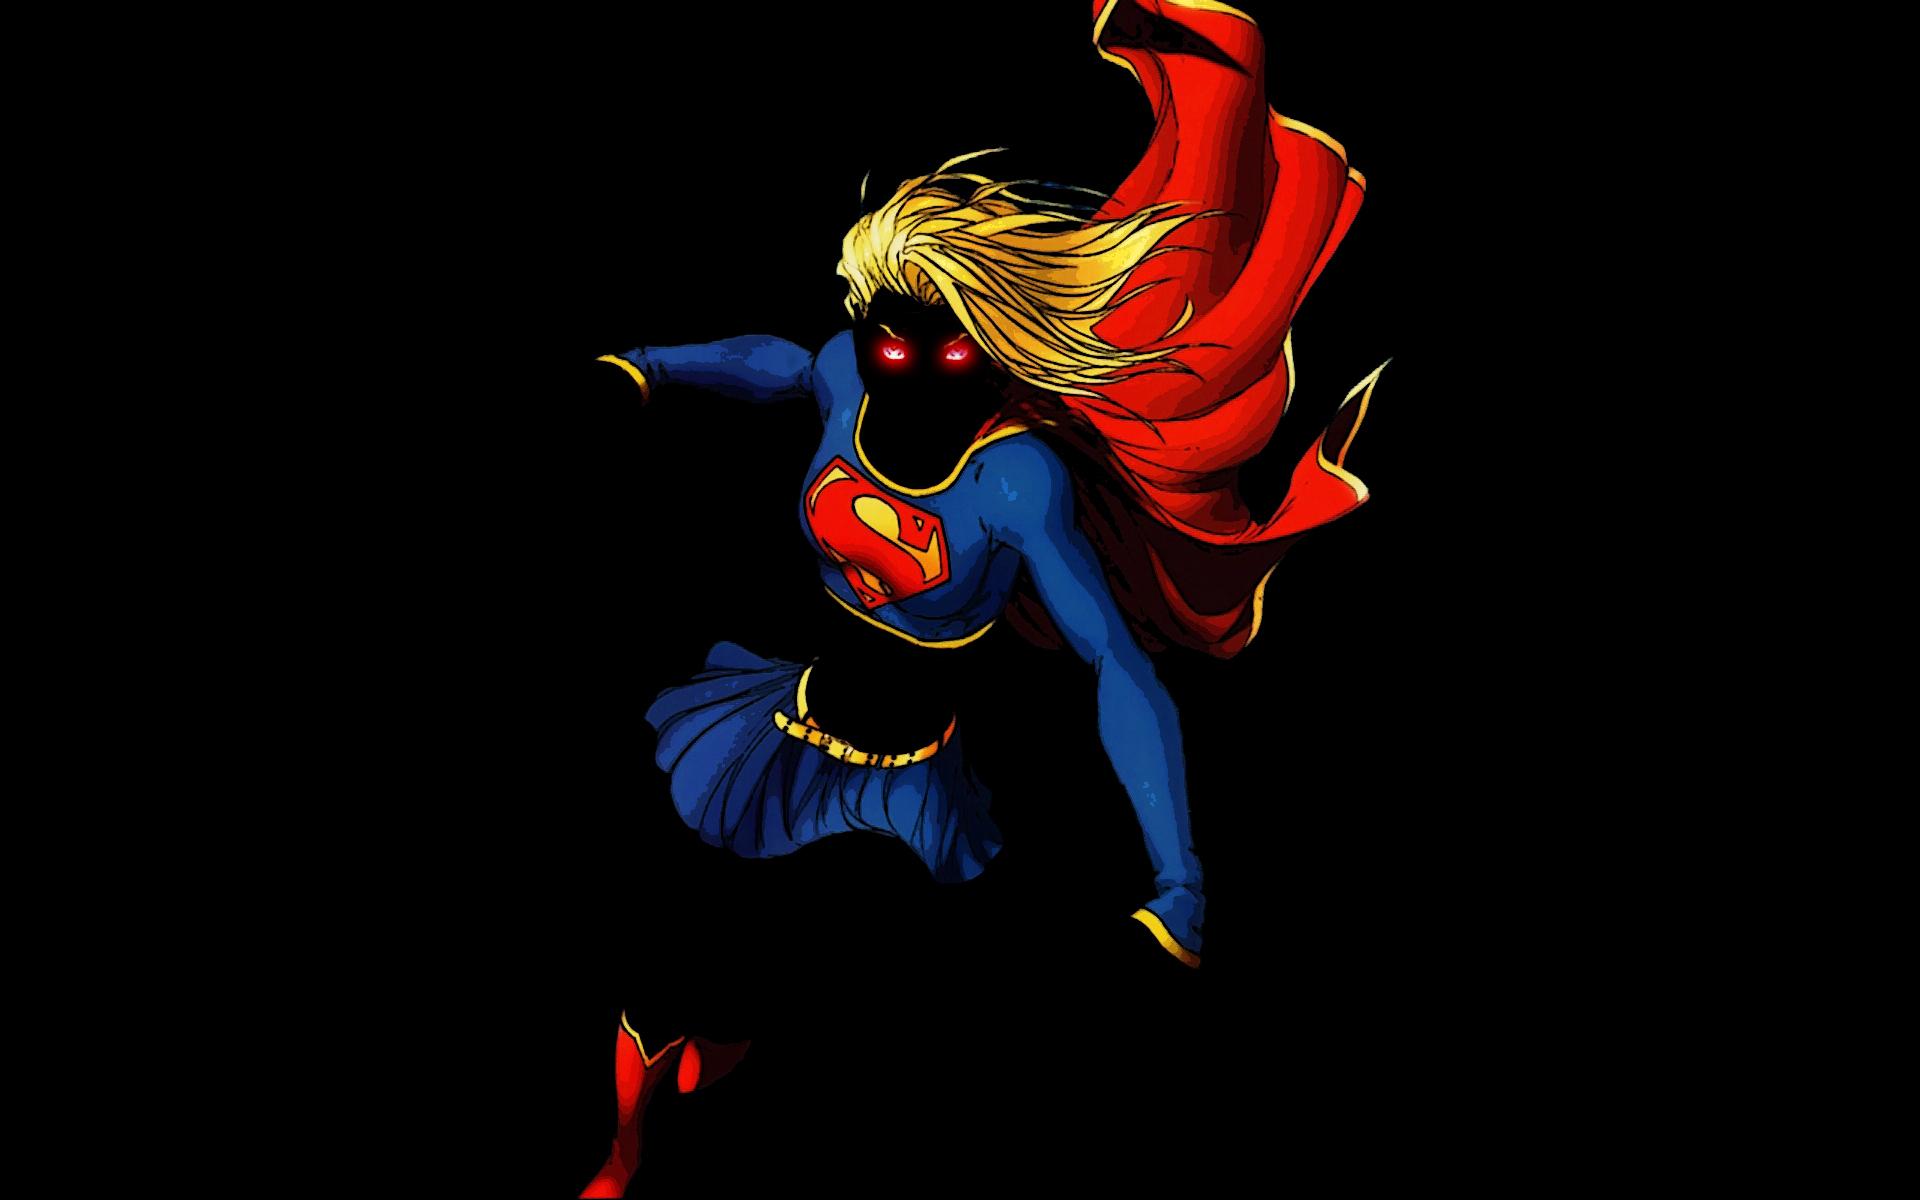 Illustration Black Background Minimalism Superhero DC Comics Superheroines Supergirl Computer Wallpaper Fictional Character